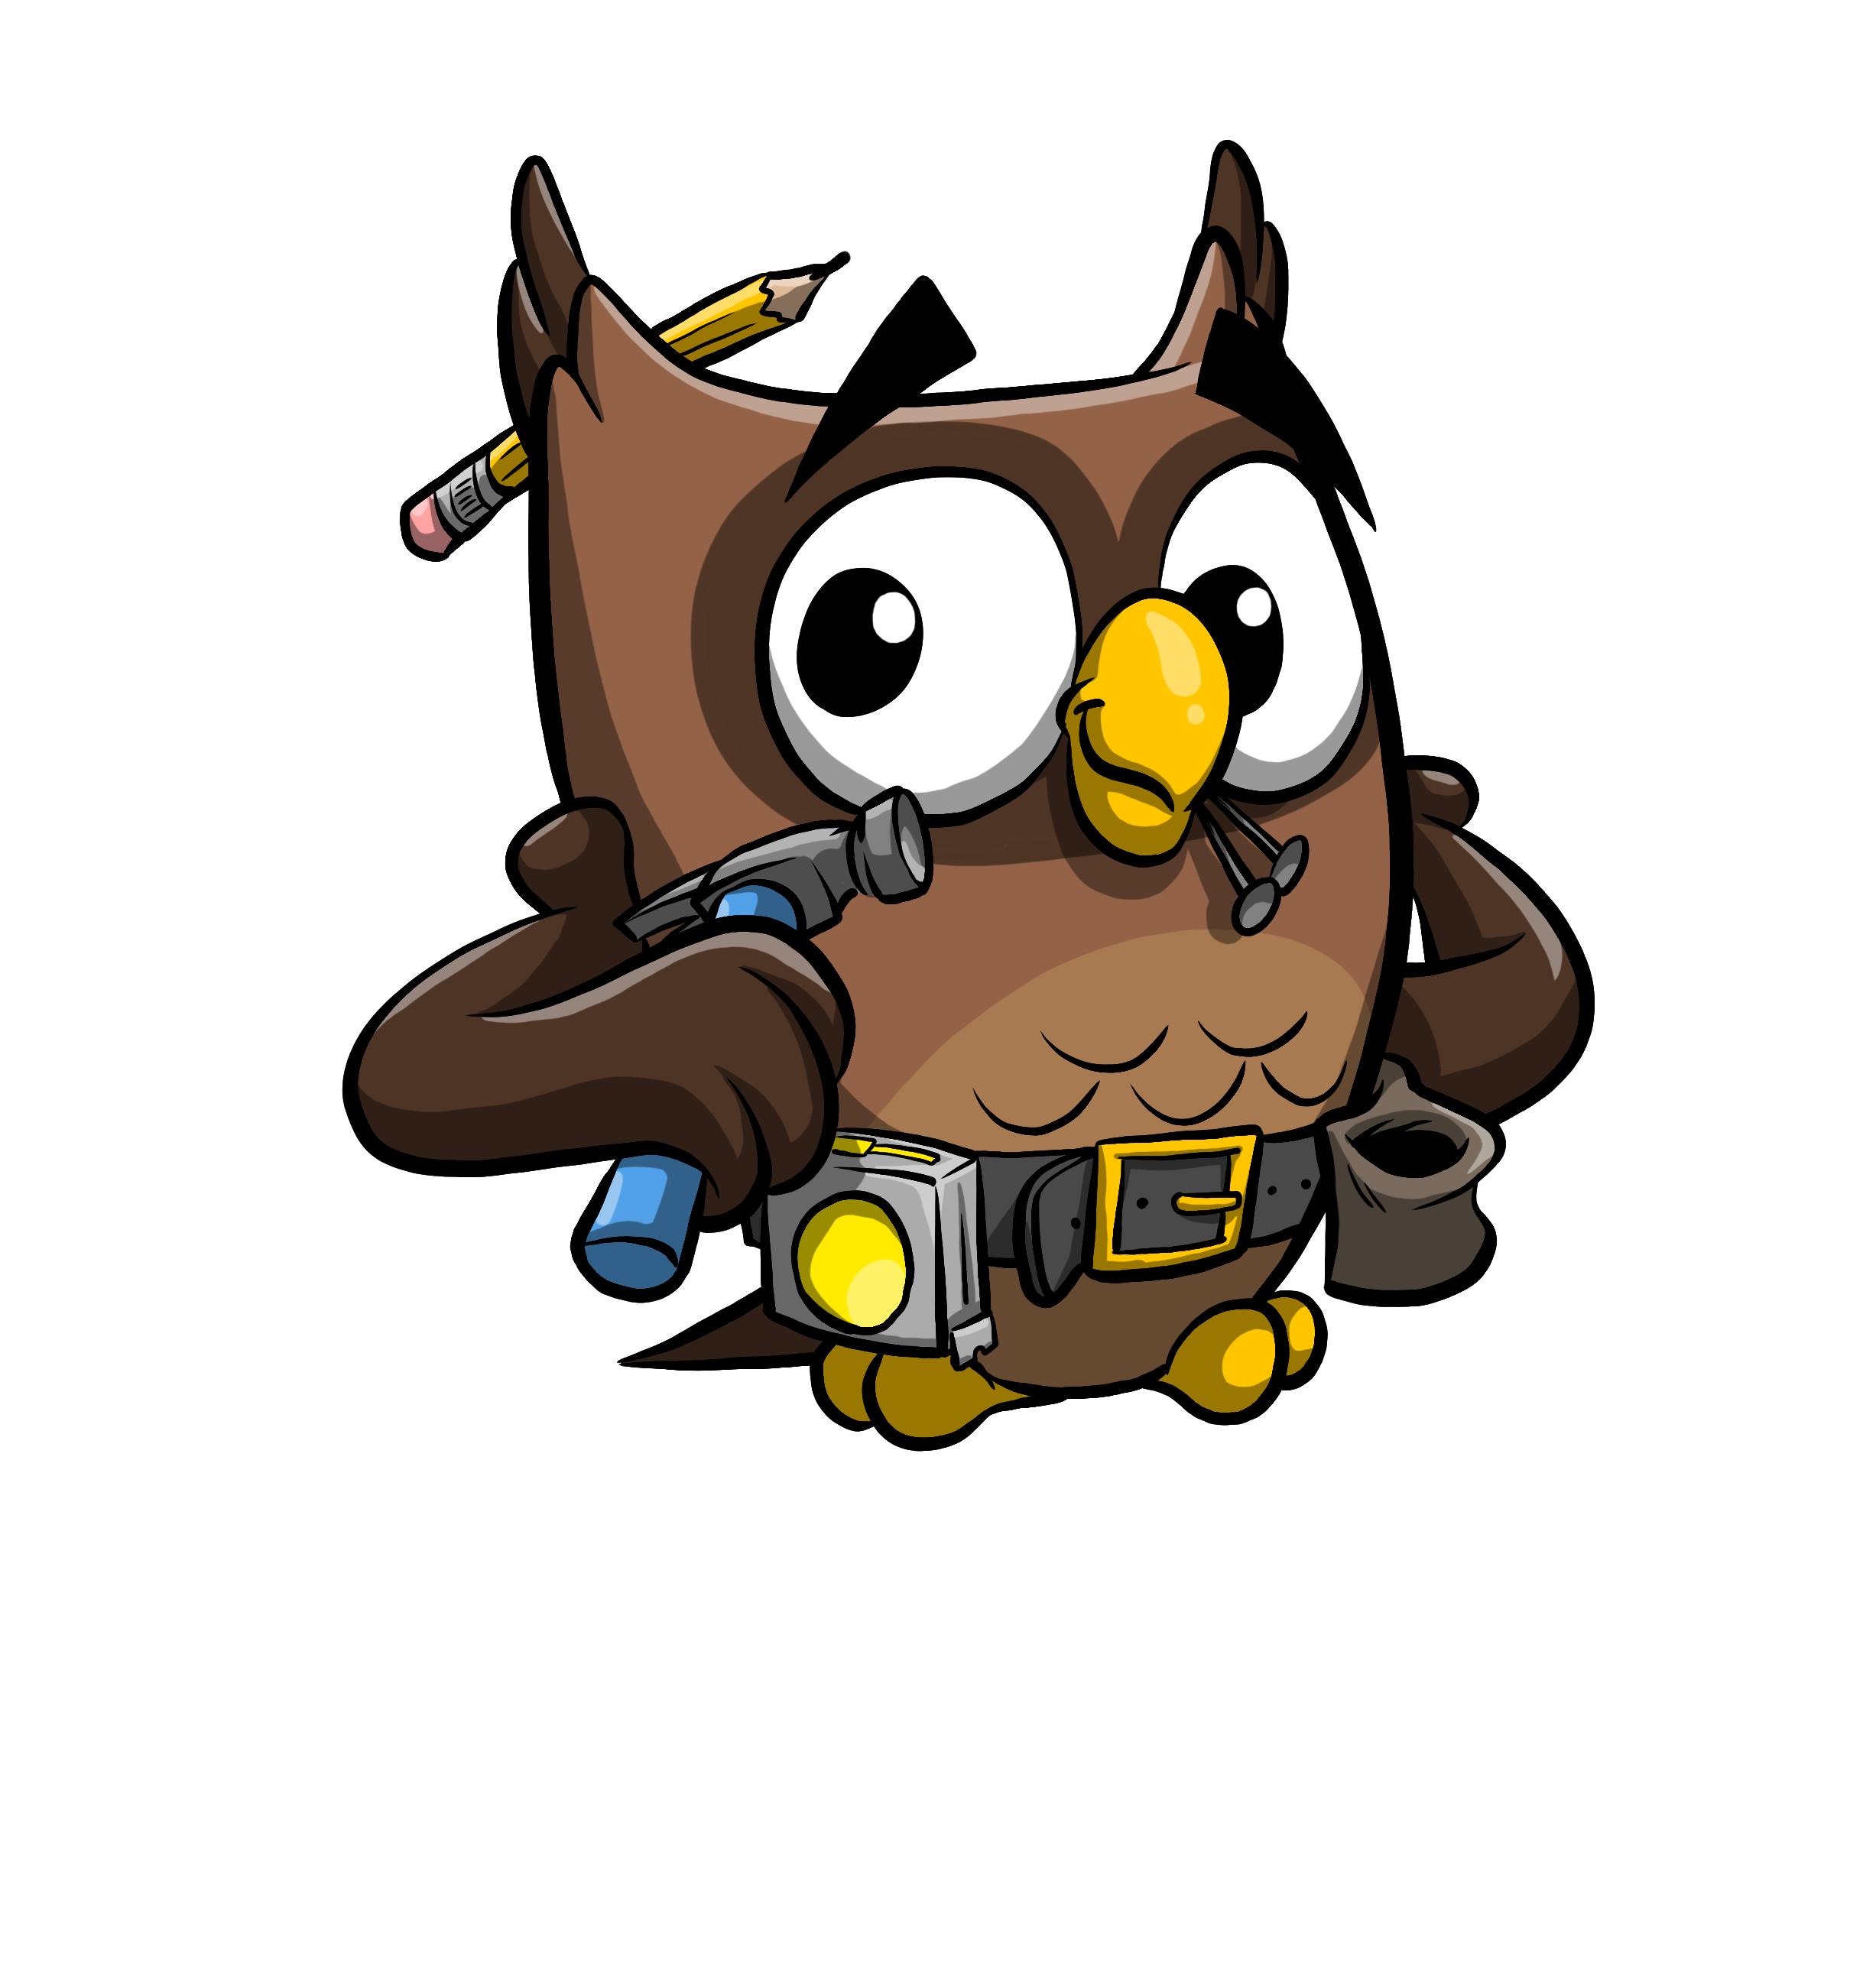 This is Owlbert as a handyman!